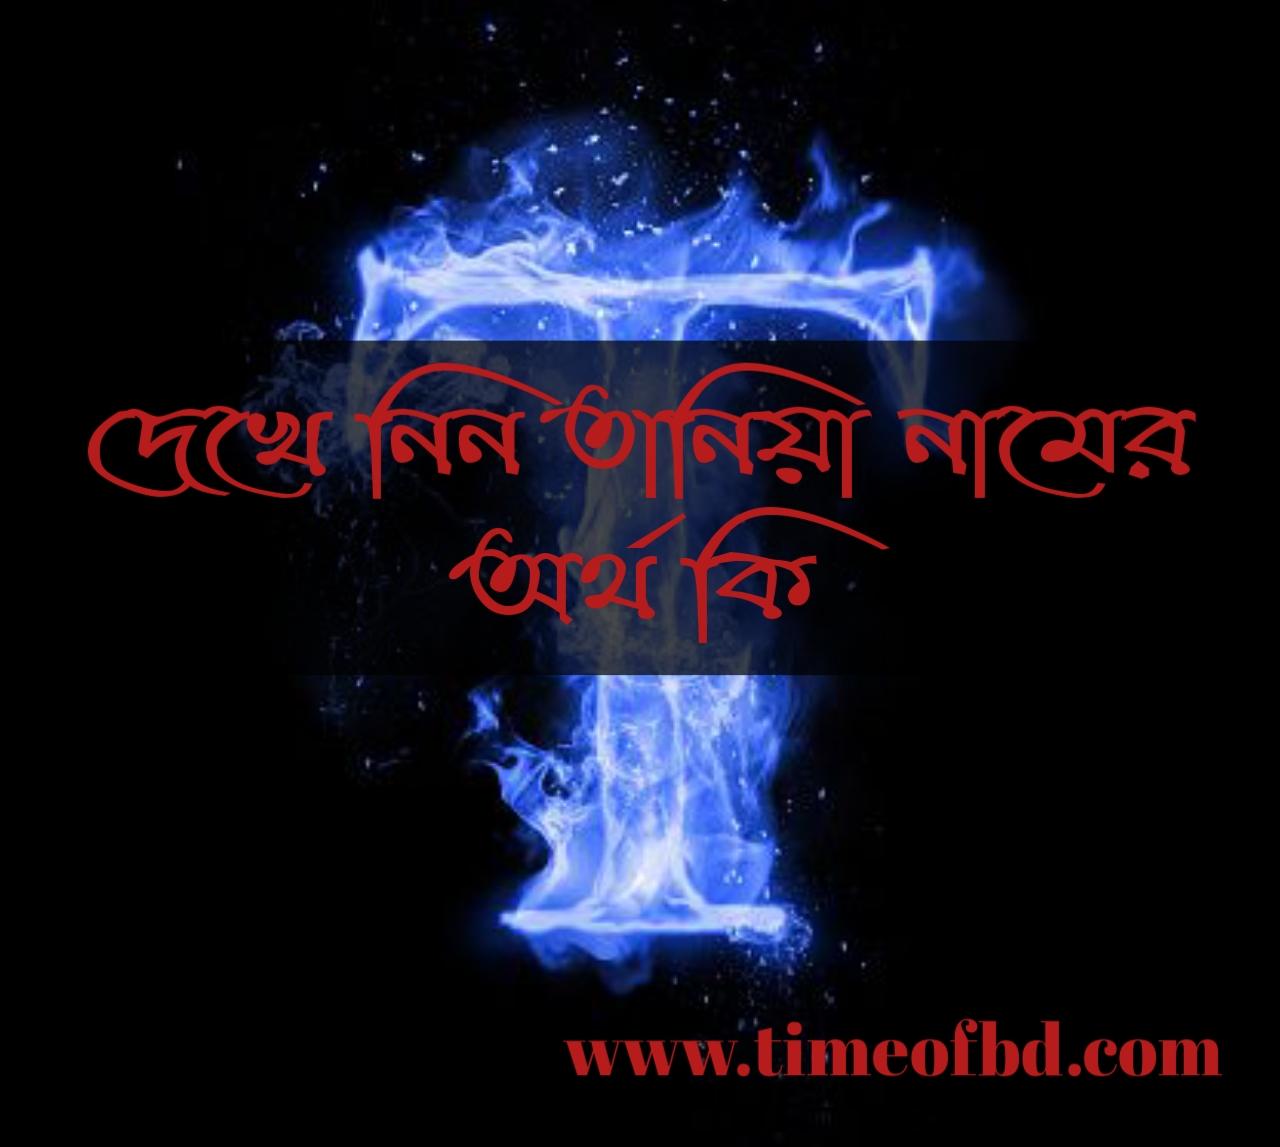 Taniya name meaning in Bengali, তানিয়া নামের অর্থ কি, তানিয়া নামের বাংলা অর্থ কি, তানিয়া নামের ইসলামিক অর্থ কি,